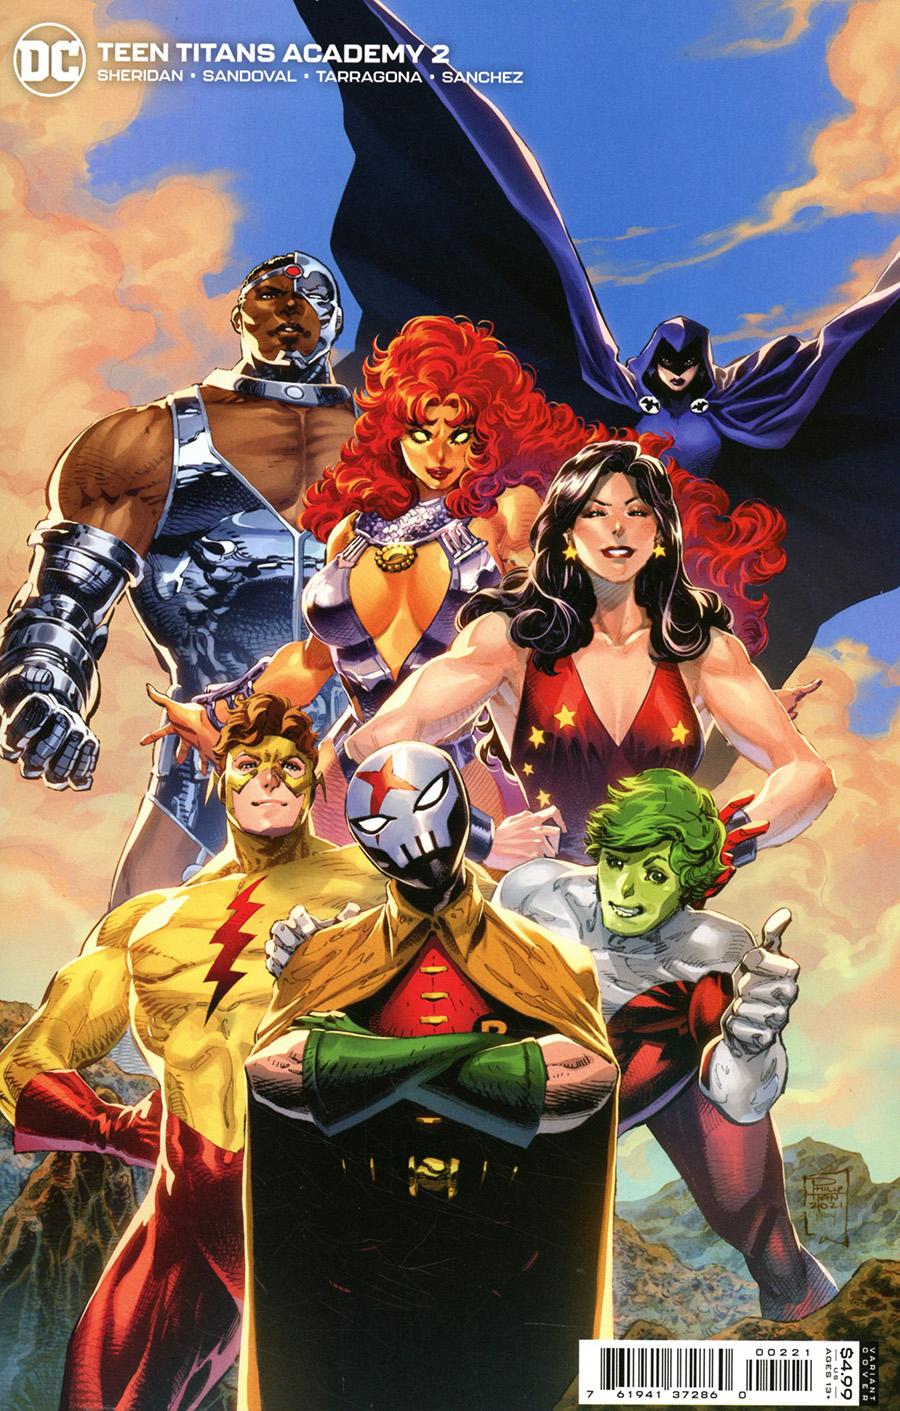 Teen Titans Academy #2 Cover B Variant Philip Tan Card Stock Cover